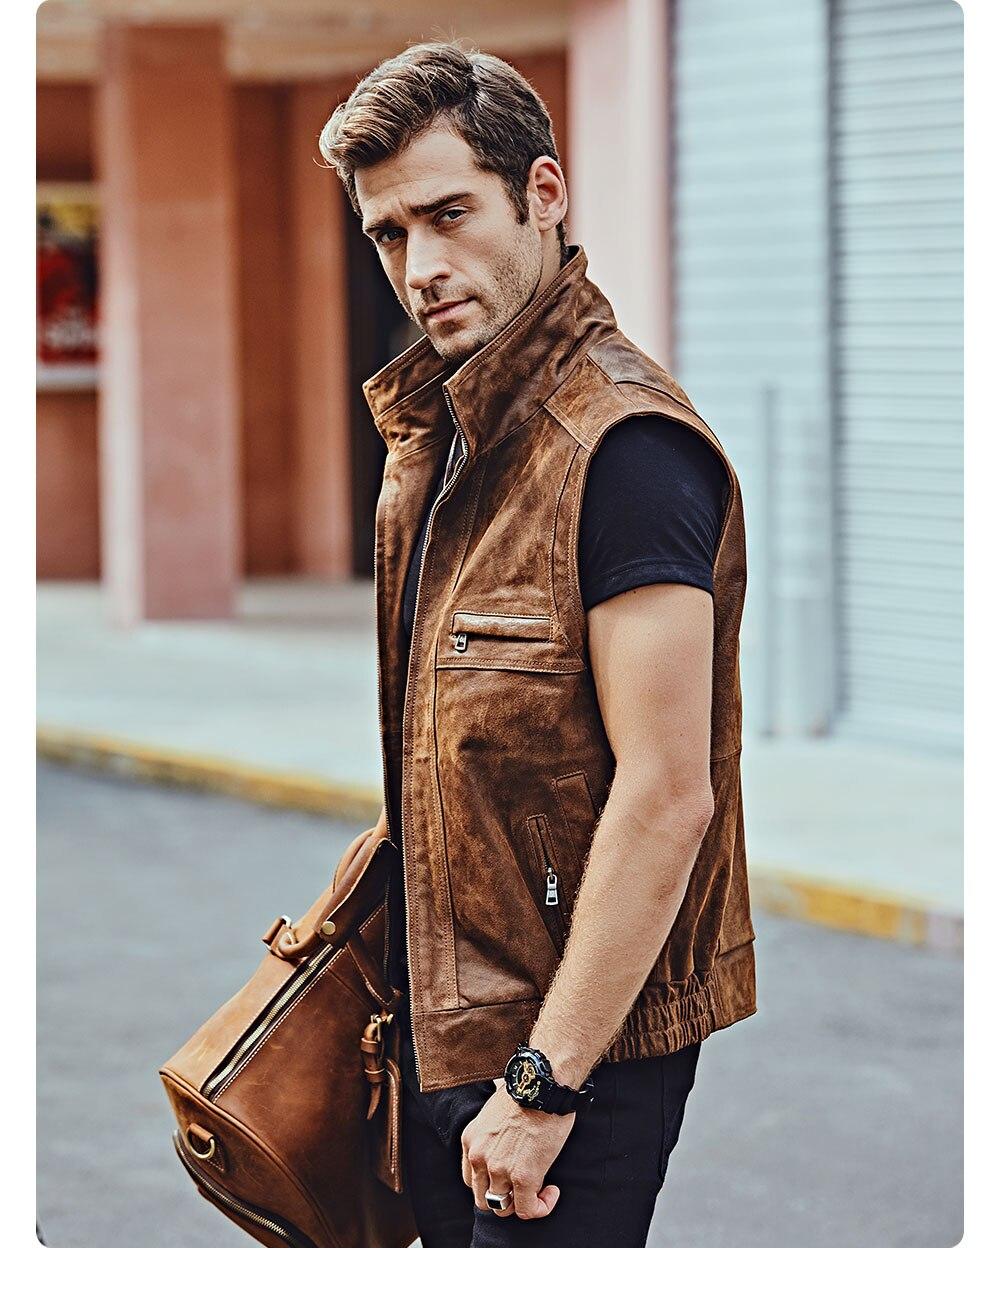 H495d4891d1244c988339d7cea433e4d0F Mew Men's Leather Retro Vest Stand Collar Men's Motorcycle Casual Vest